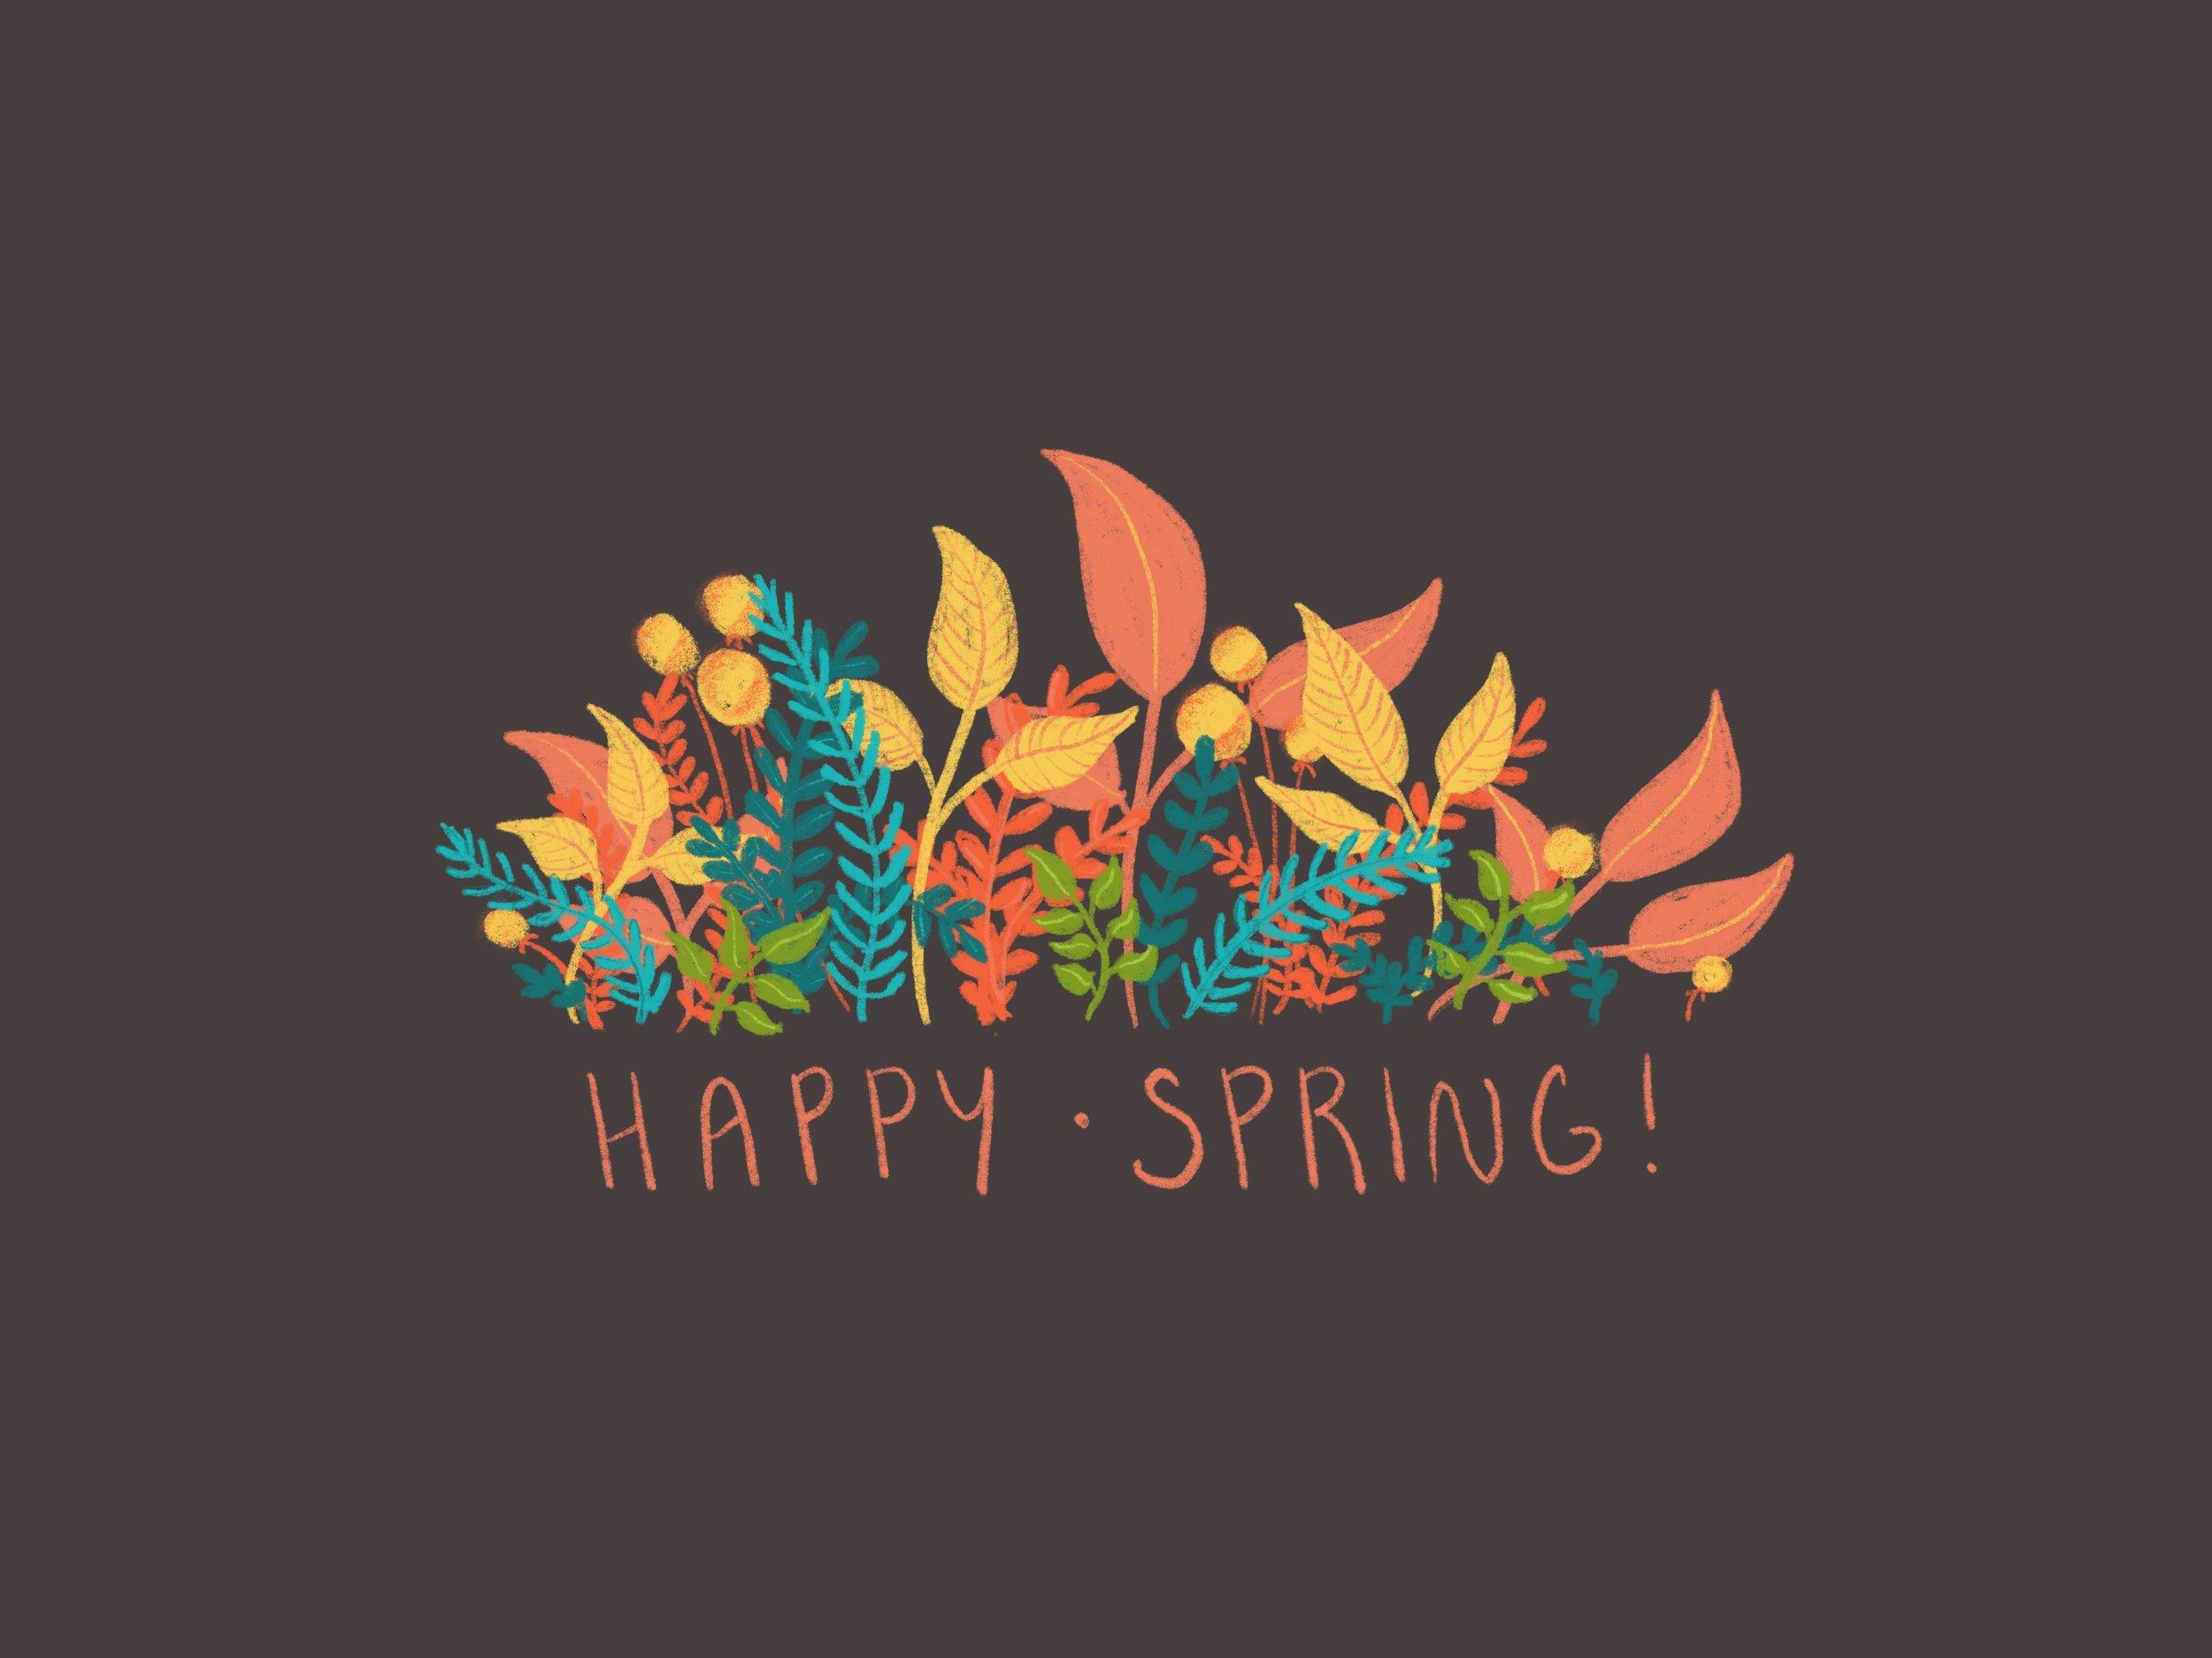 Happy_Spring_greybkgrnd.jpg